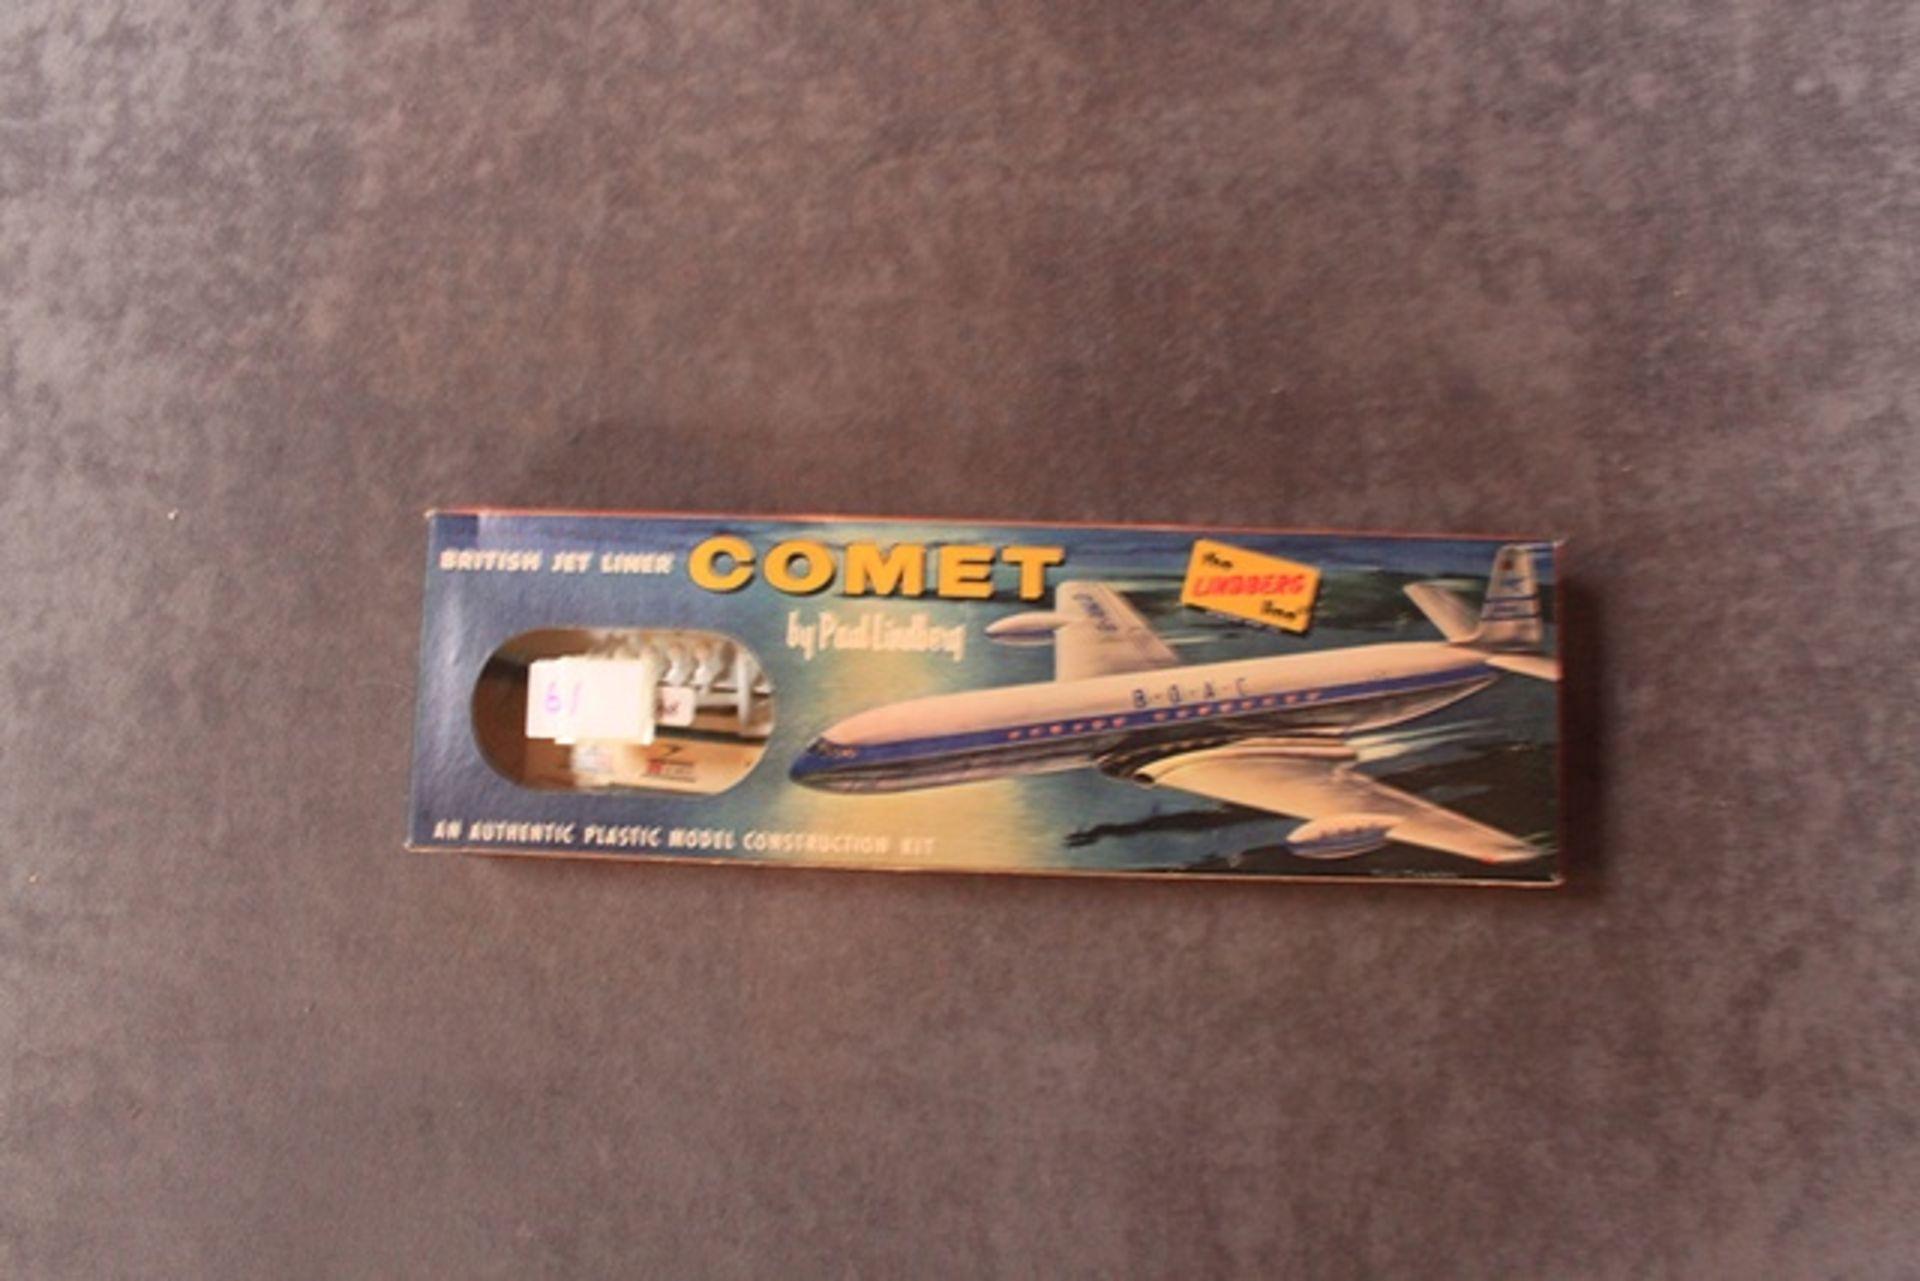 Lot 61 - The Lindberg Kit No 455:49 British Jet Liner Comet In Great Unopened Box